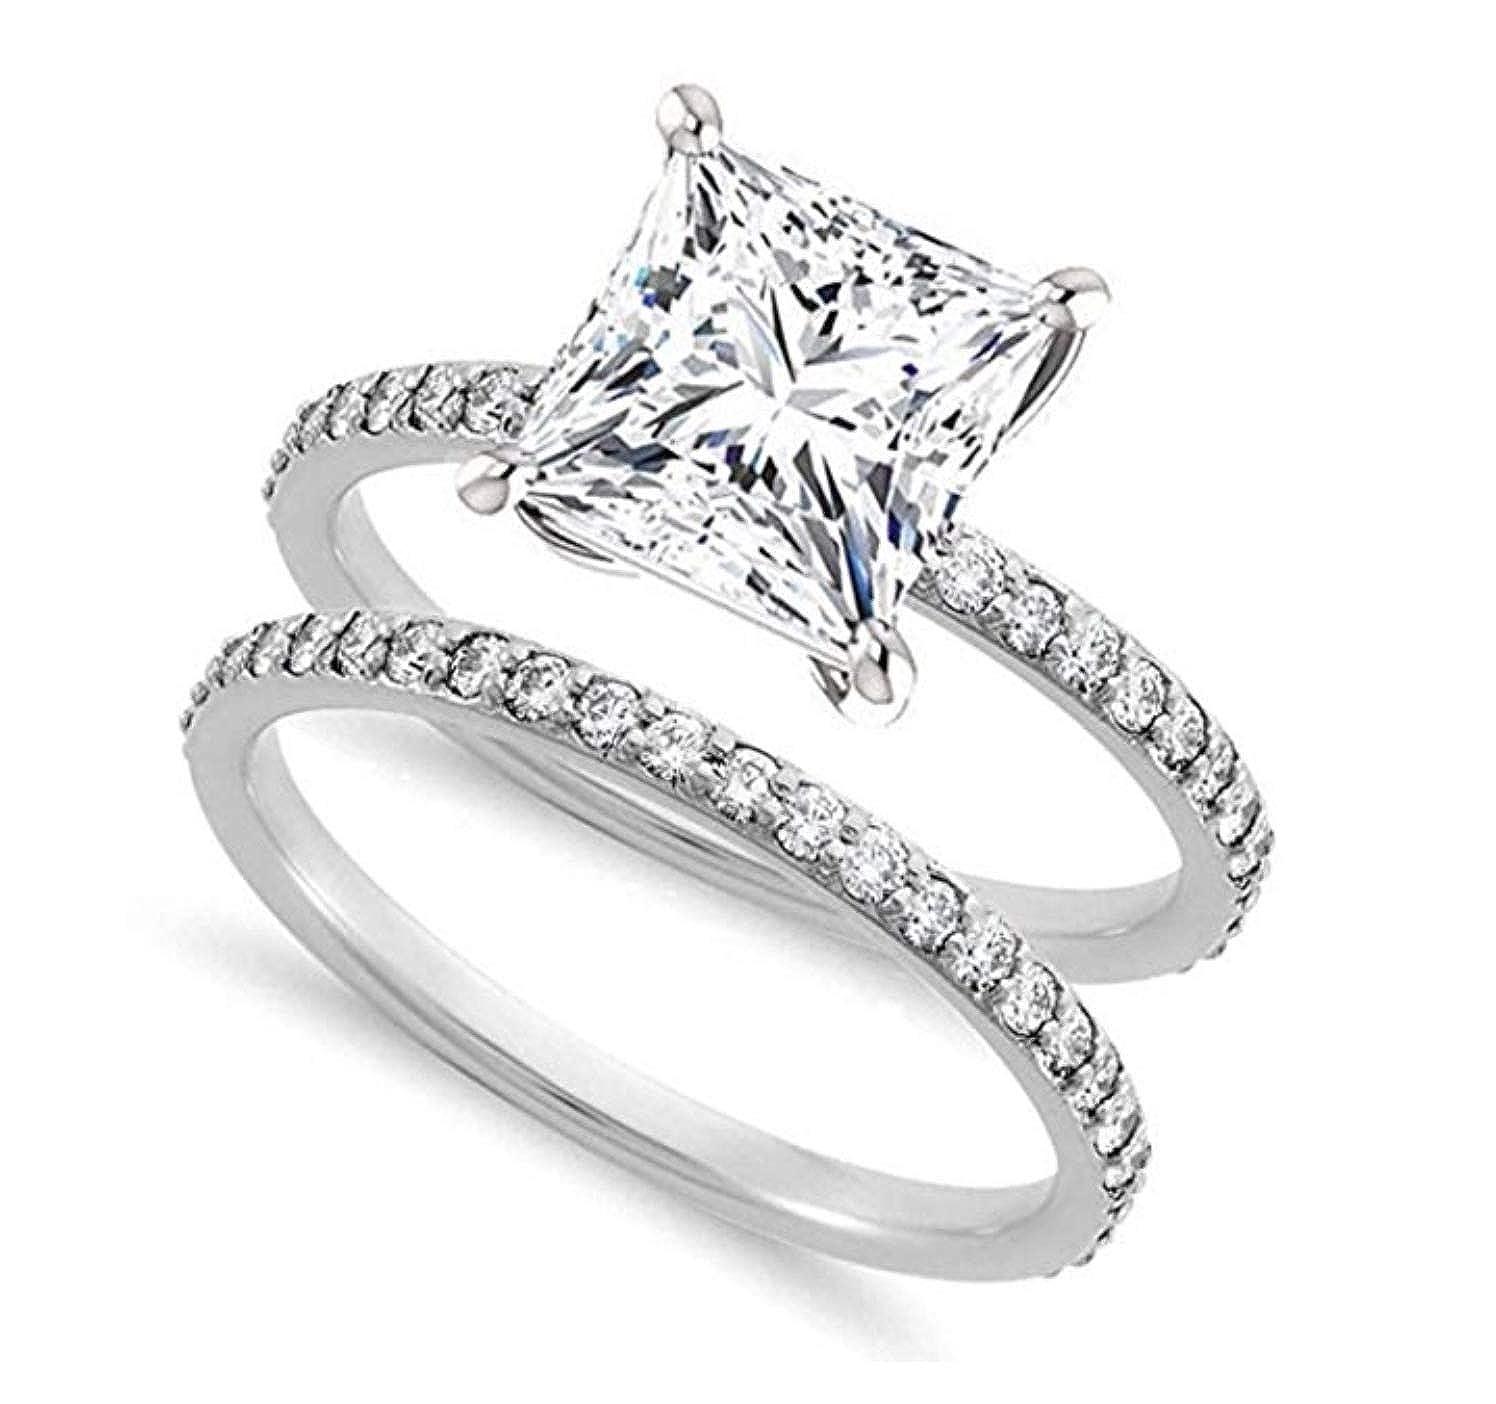 f4aaf9ef3d494 Venetia Realistic Supreme 1.5 Carat Princess Cut NSCD Simulated Diamond  Ring Band Set 925 Silver Platinum Plate